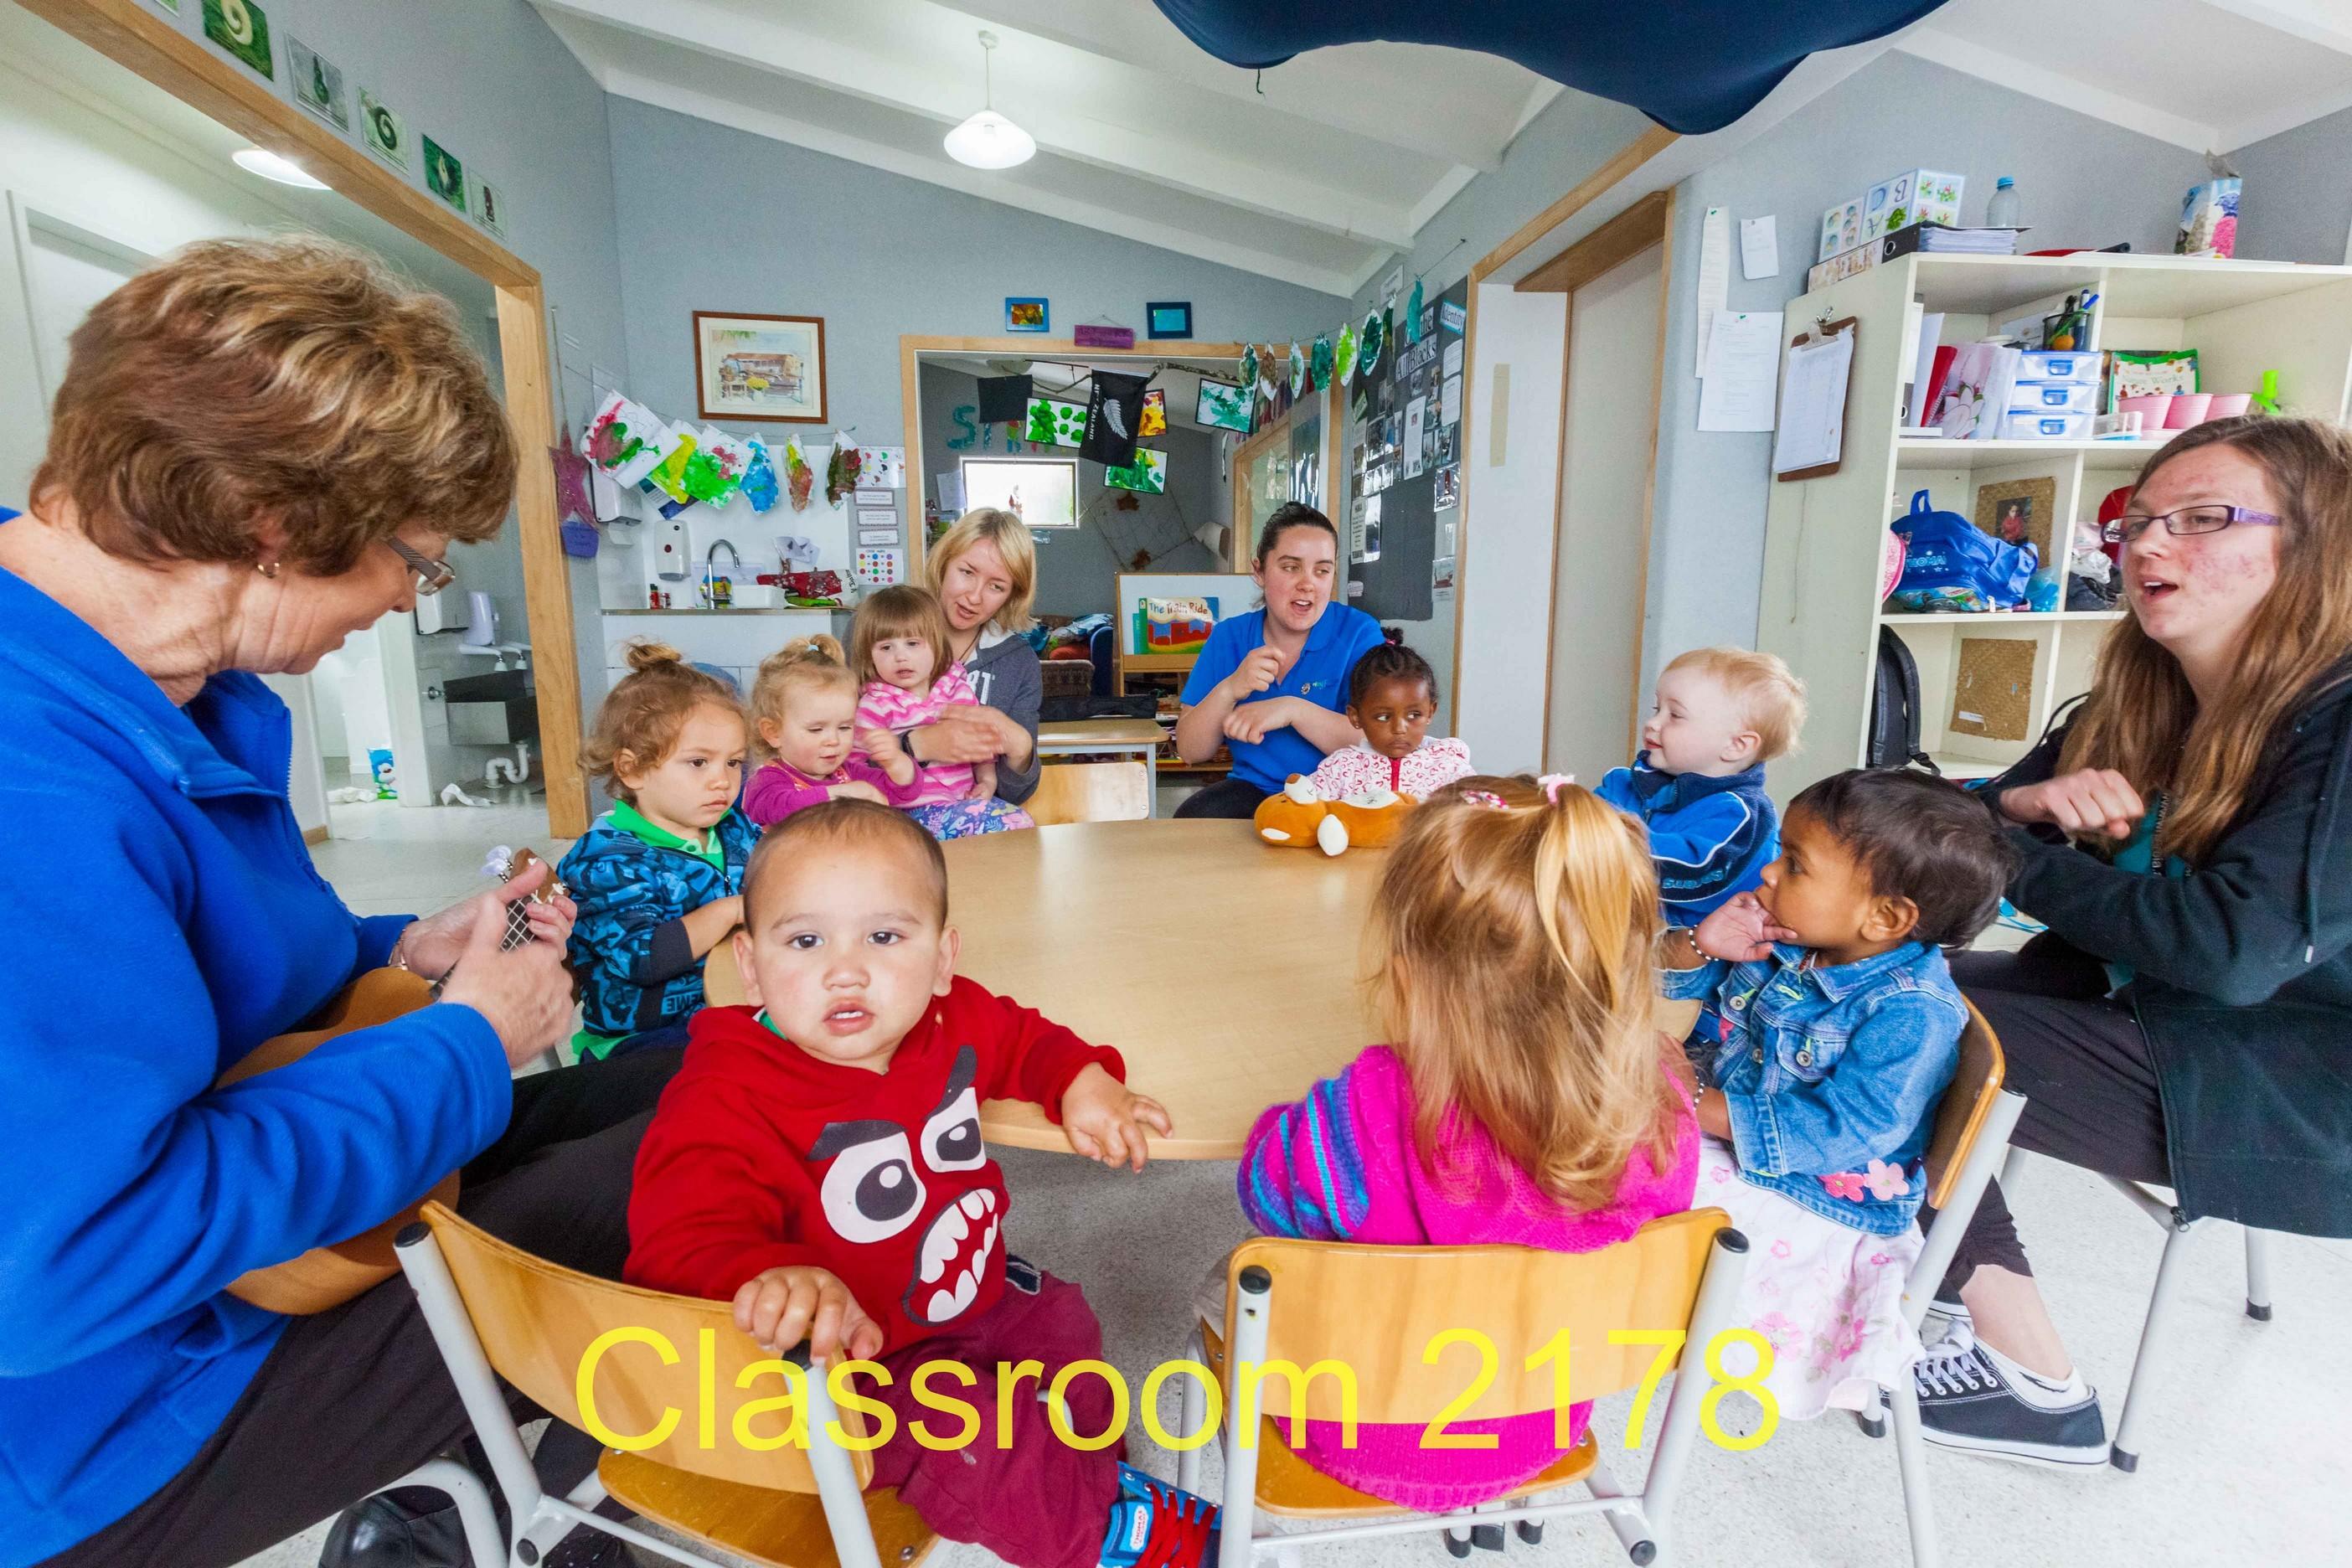 Classroom 2178